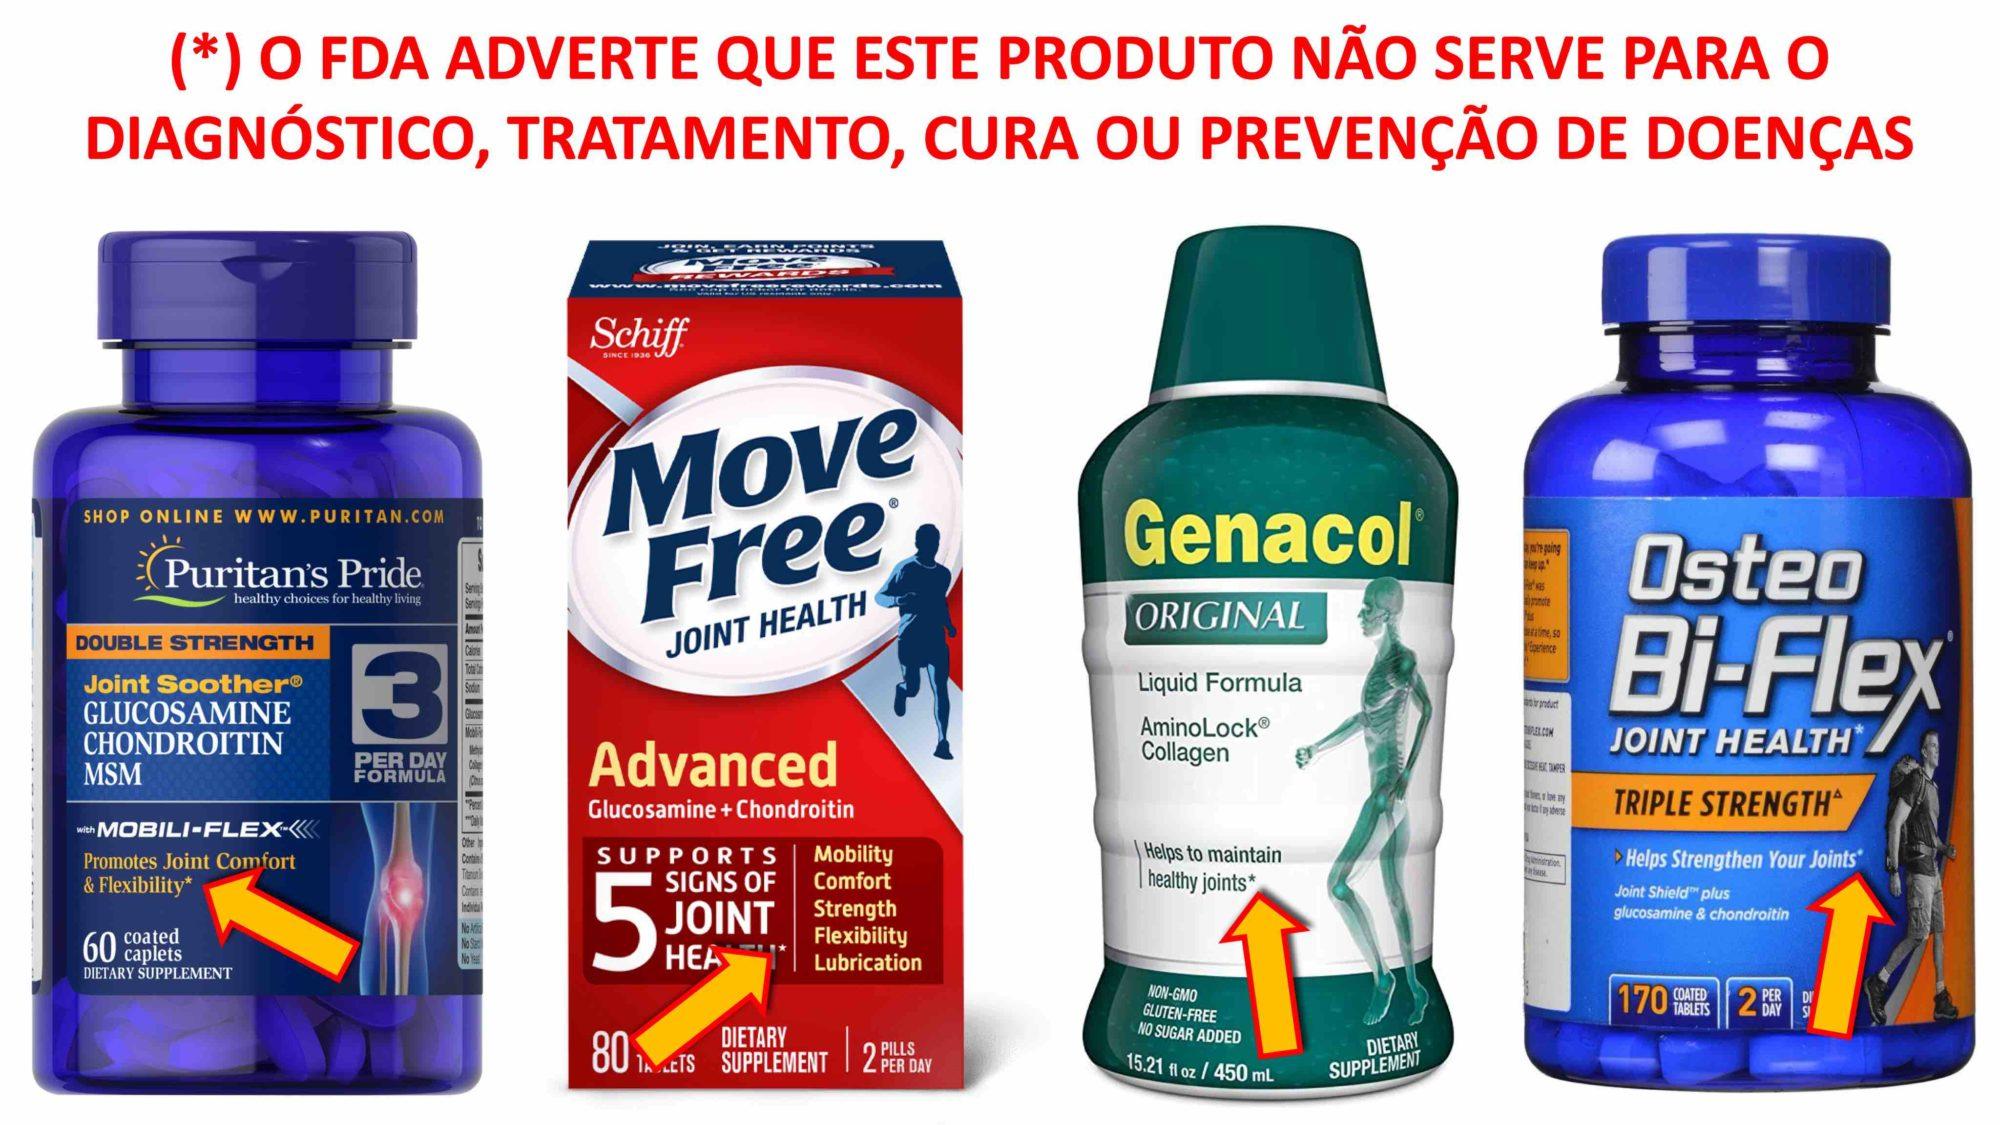 ADVERTÊNCIA DO FDA PARA SUPLEMENTOS